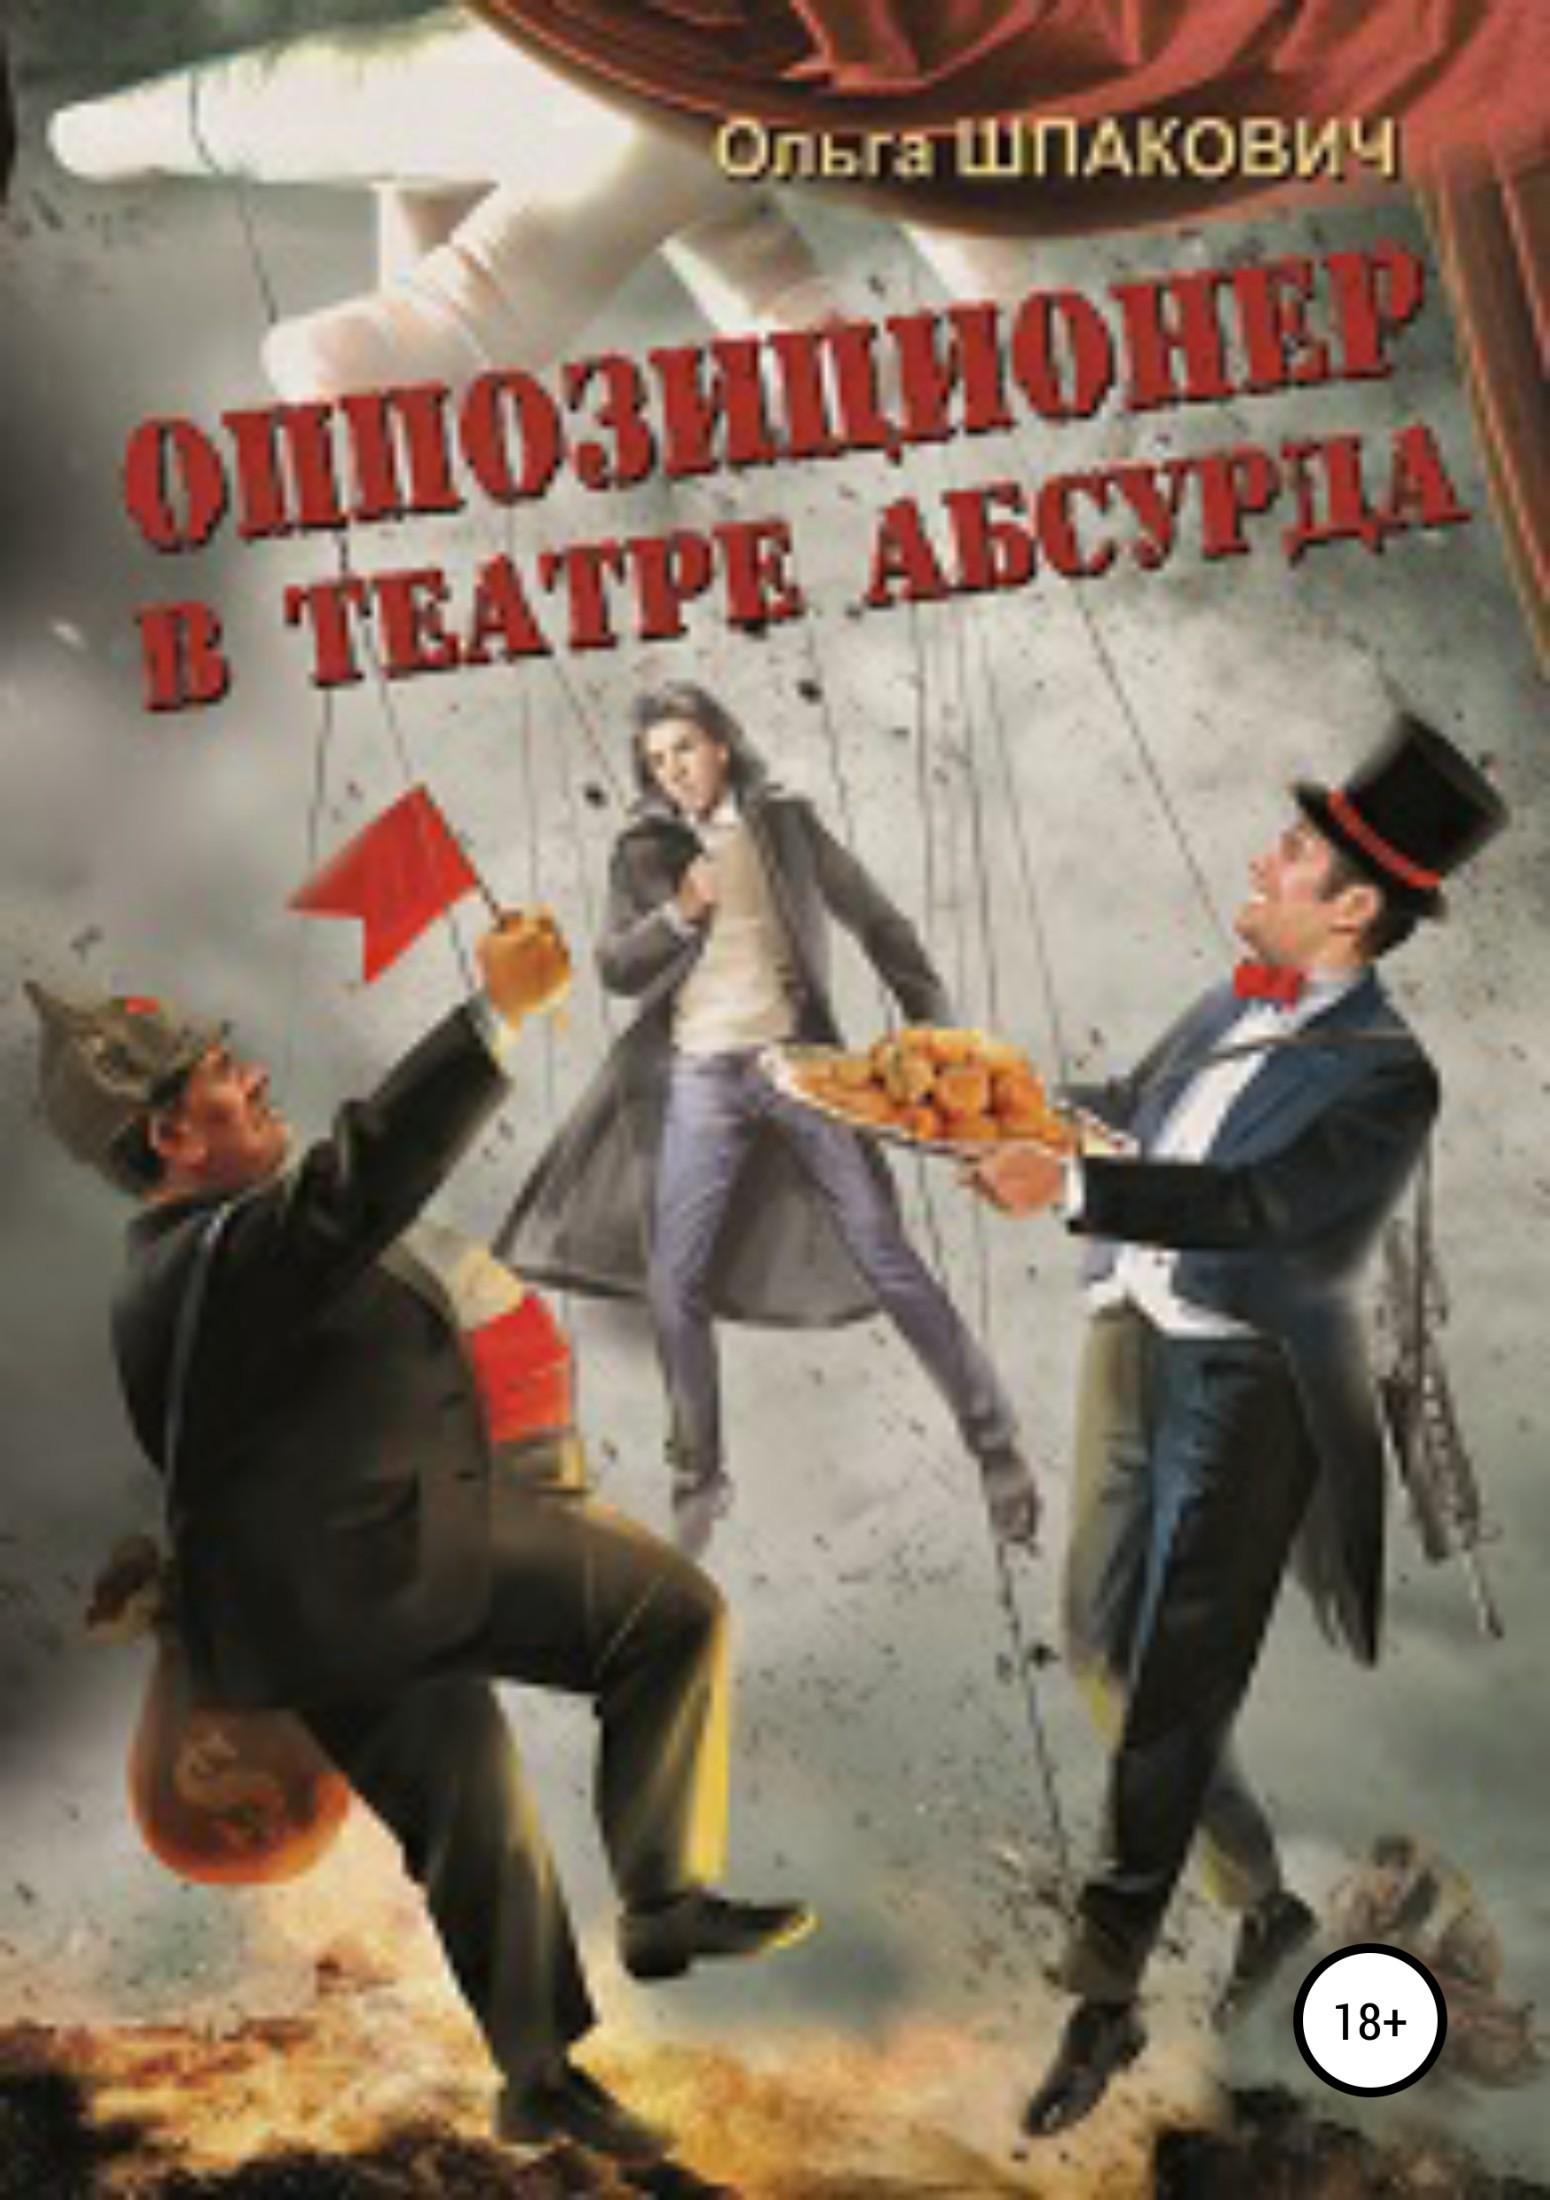 Ольга Геннадьевна Шпакович Оппозиционер в театре абсурда цены онлайн